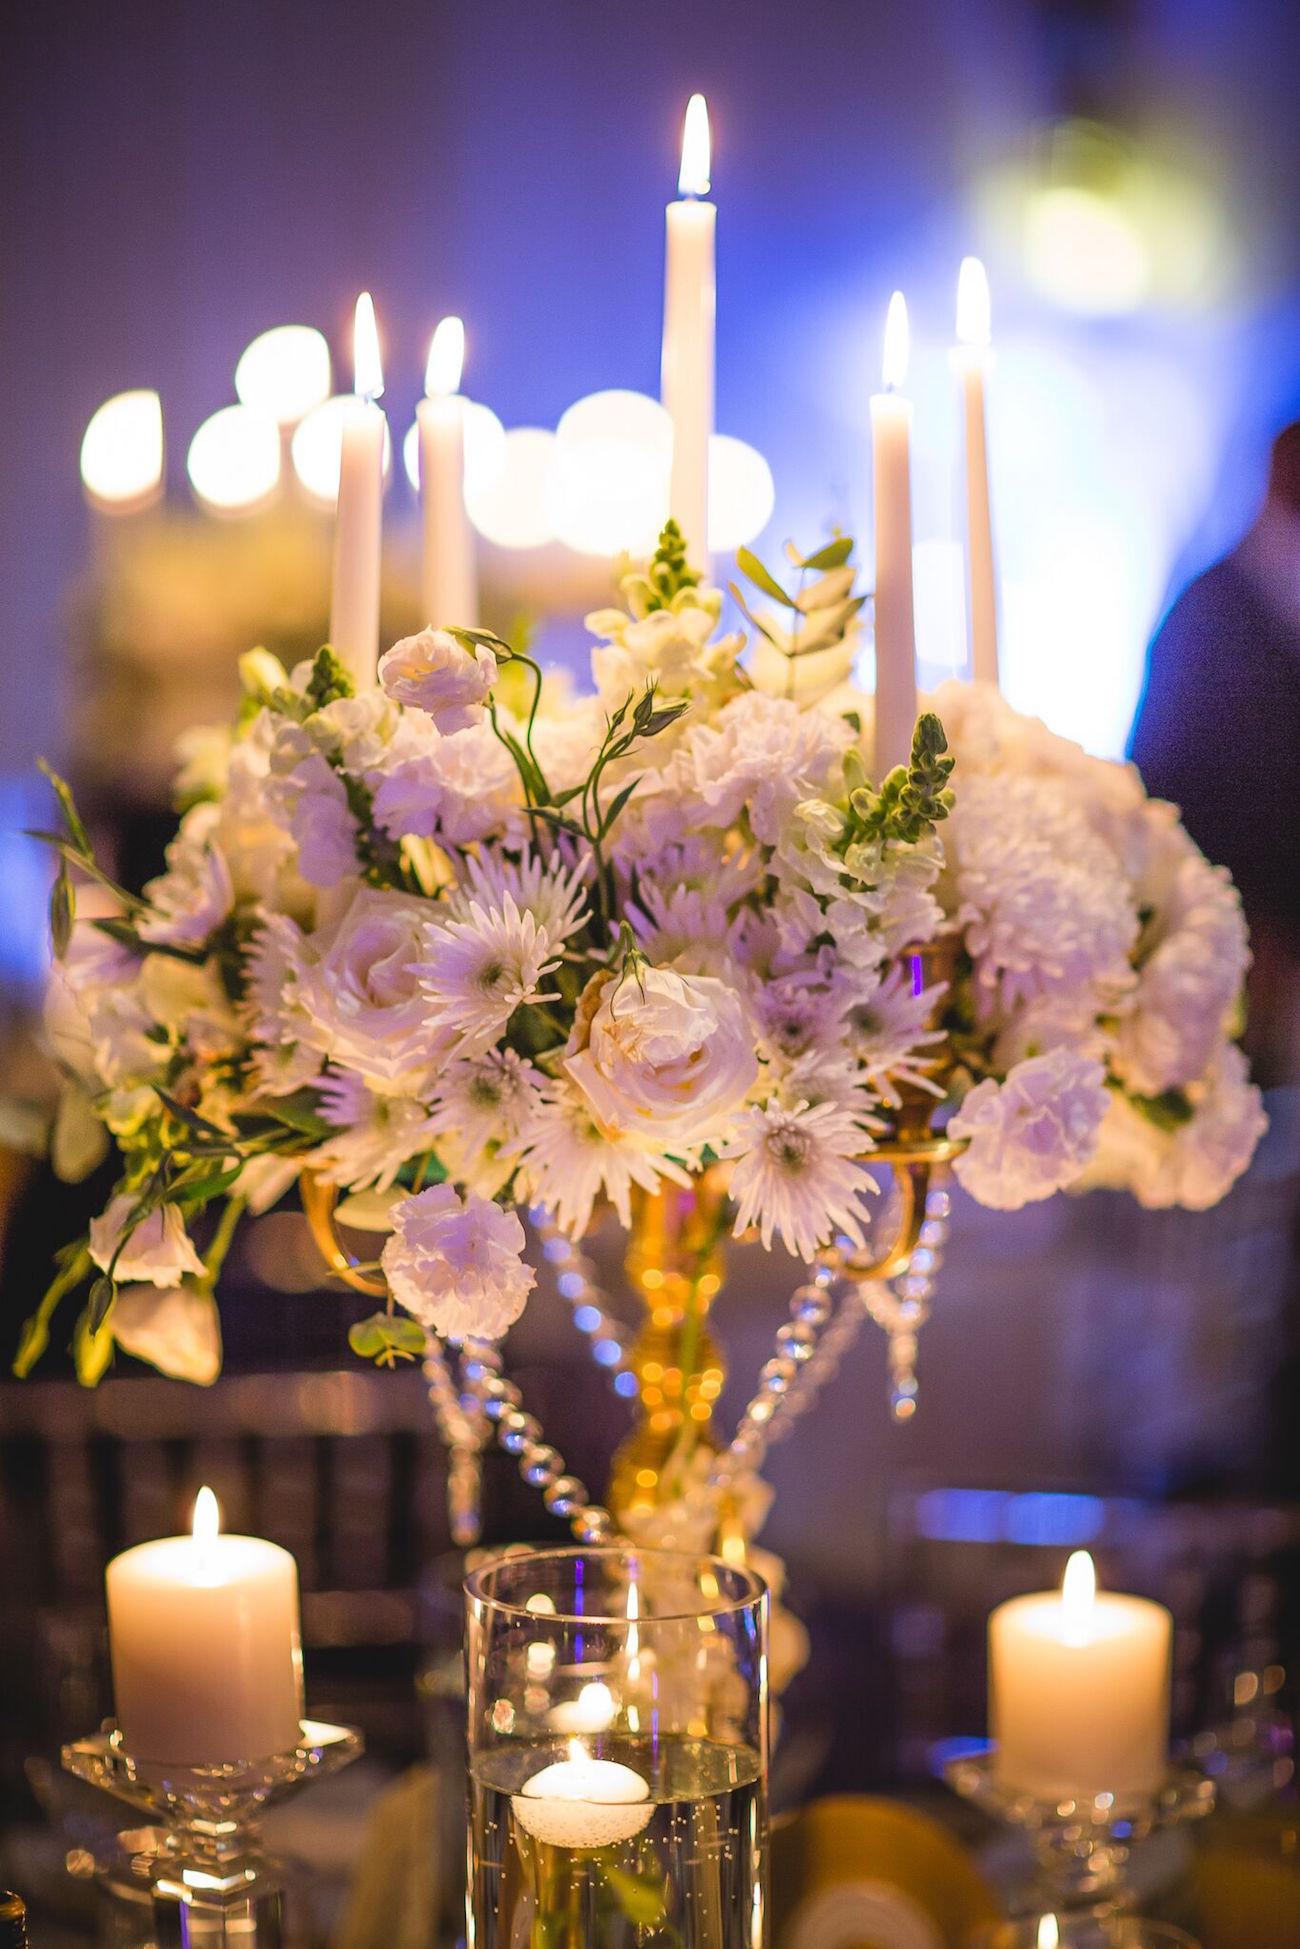 Opulent Ballroom Wedding Centerpiece | Image: Daryl Glass